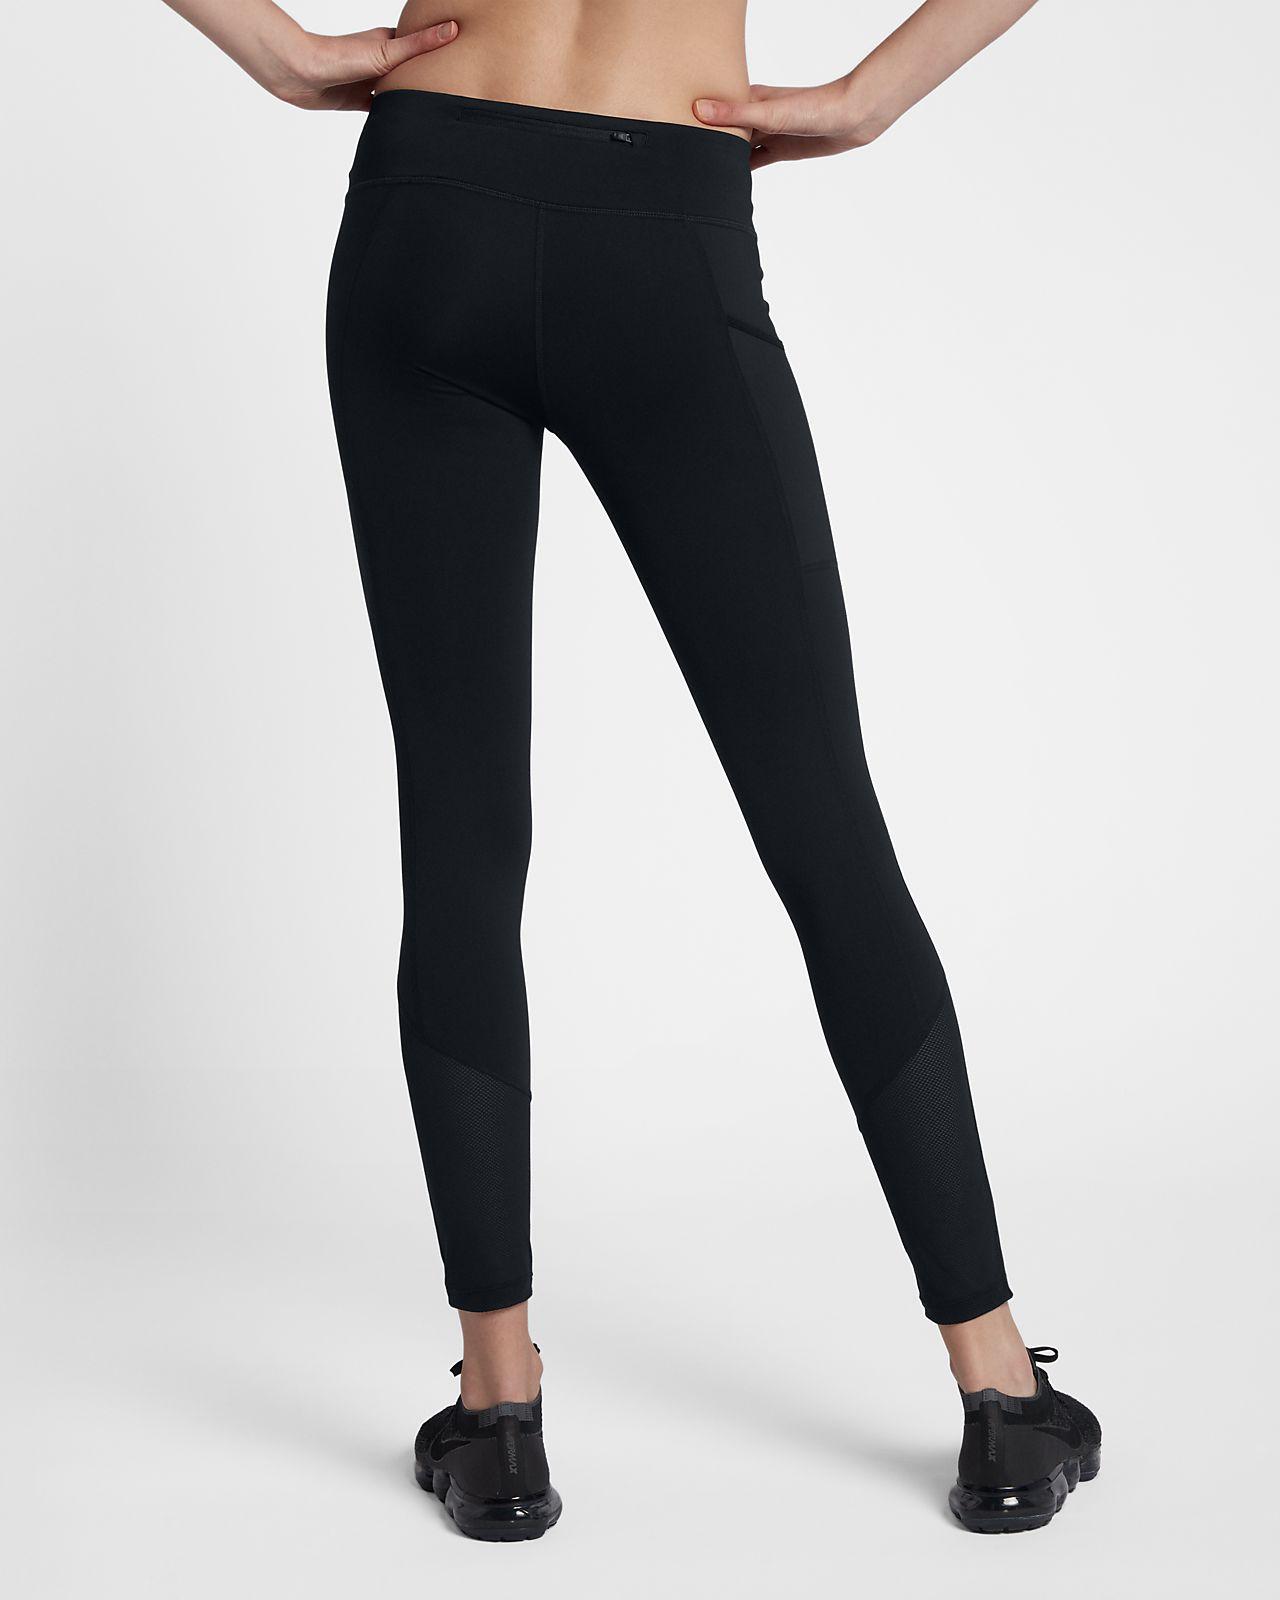 nike racer women 39 s 28 running tights. Black Bedroom Furniture Sets. Home Design Ideas